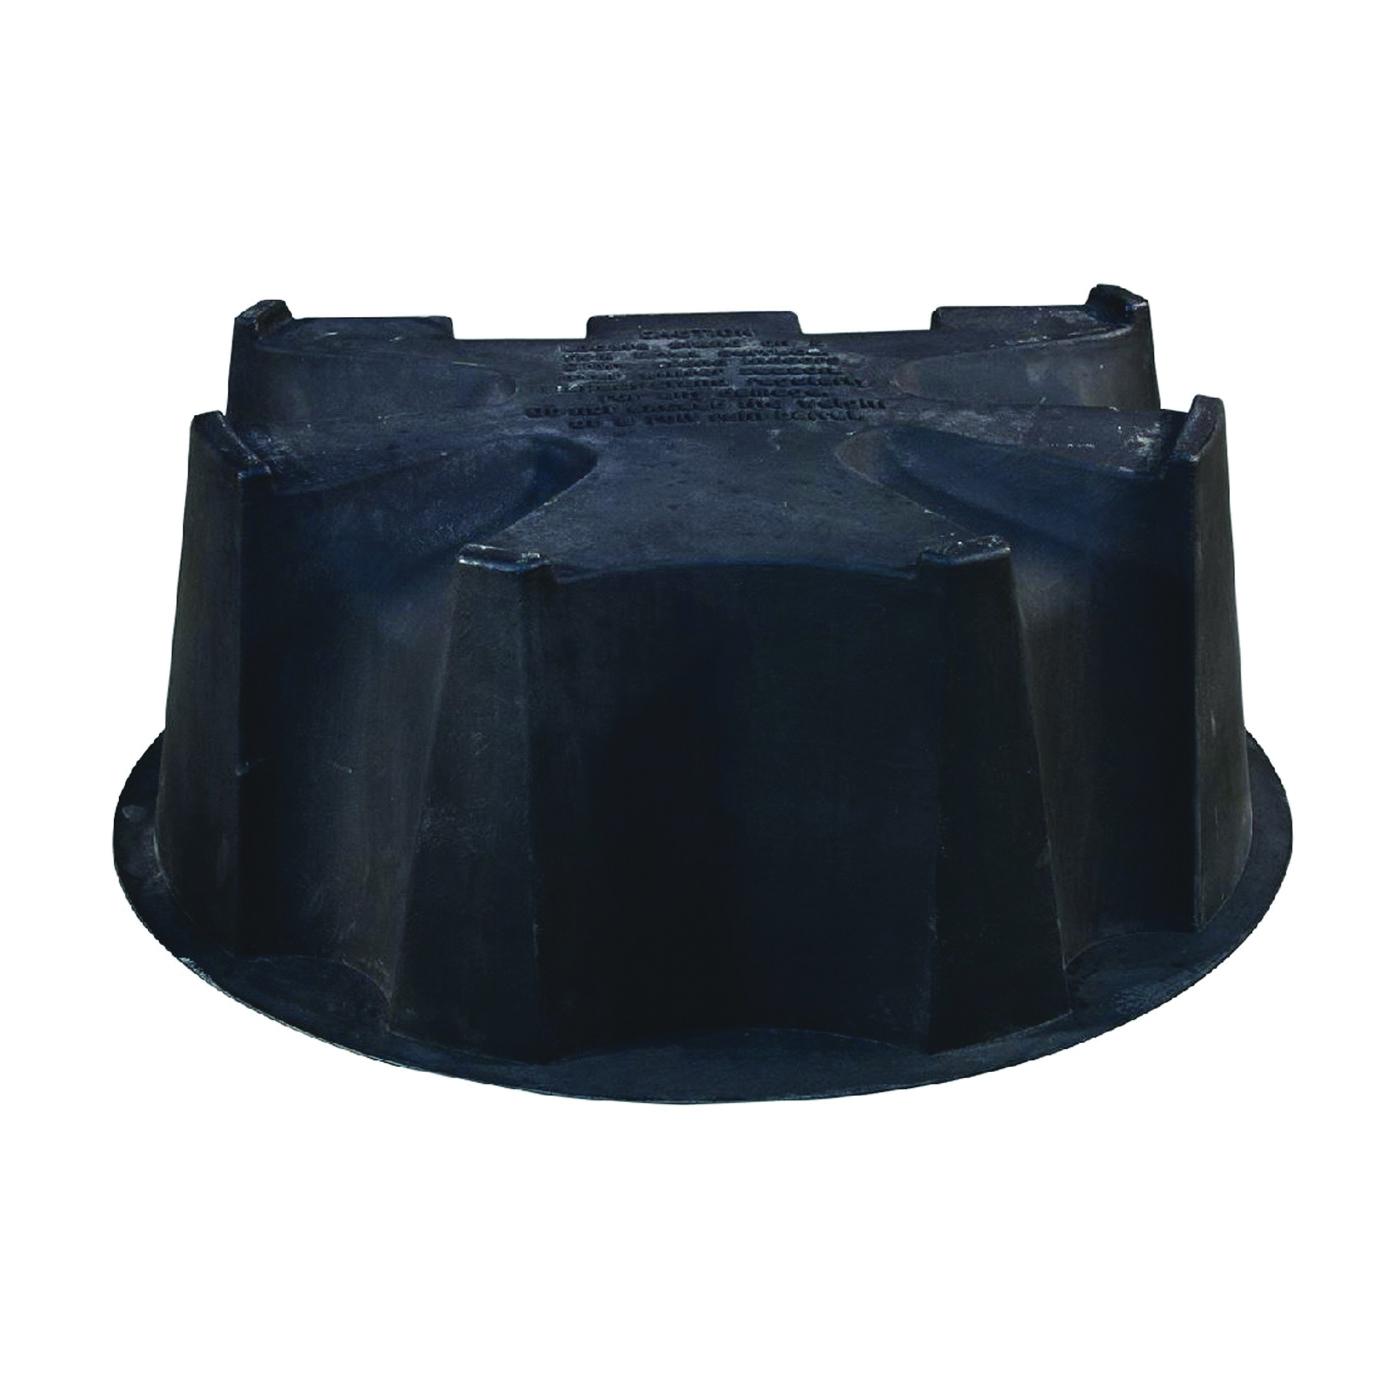 Picture of RTS 55100002008000 Rain Barrel Stand, Black